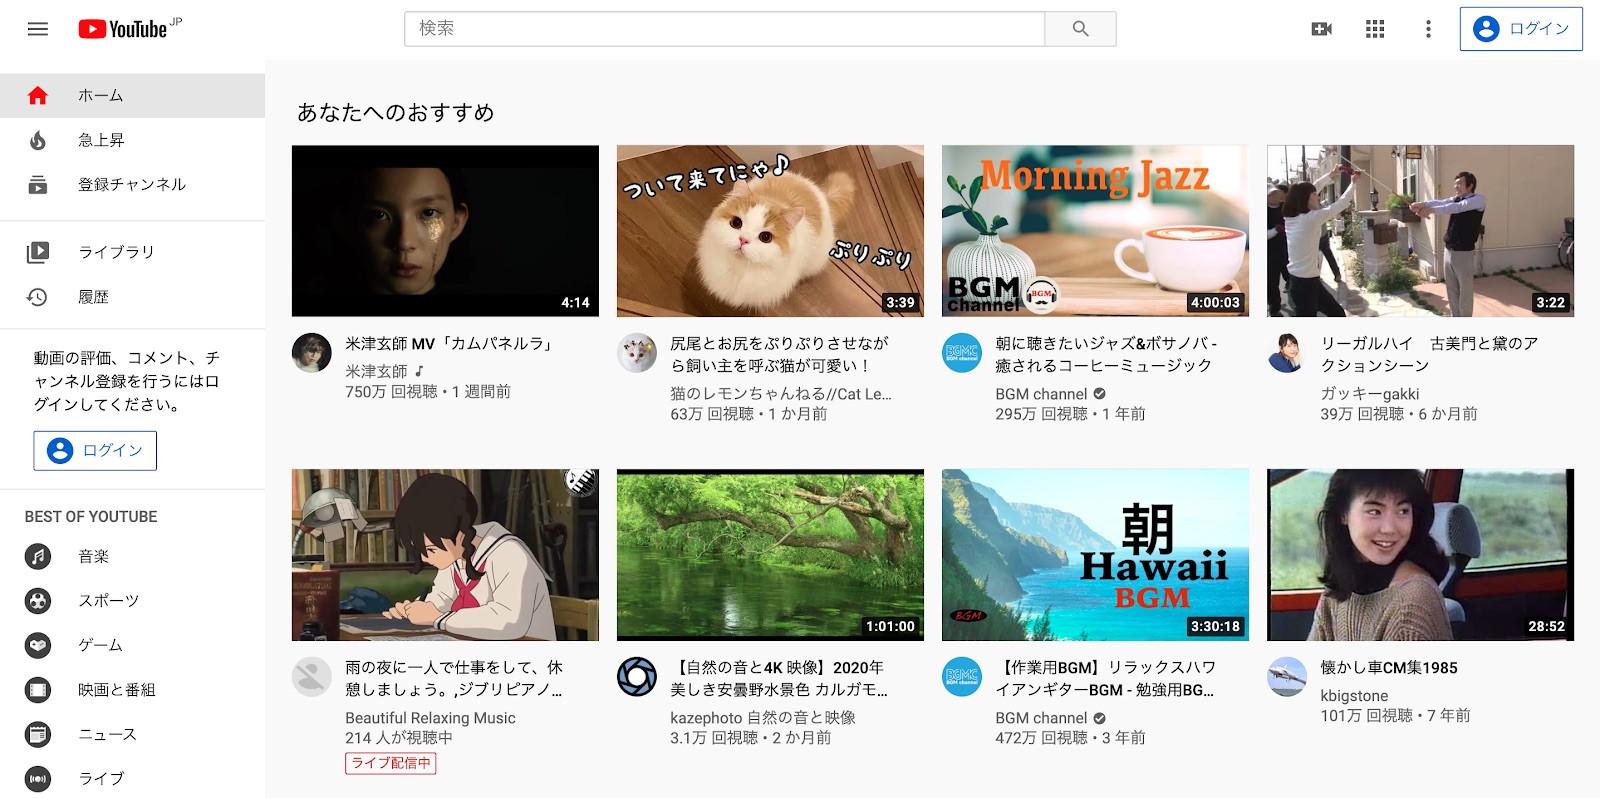 YouTube【動画の冒頭に注目】